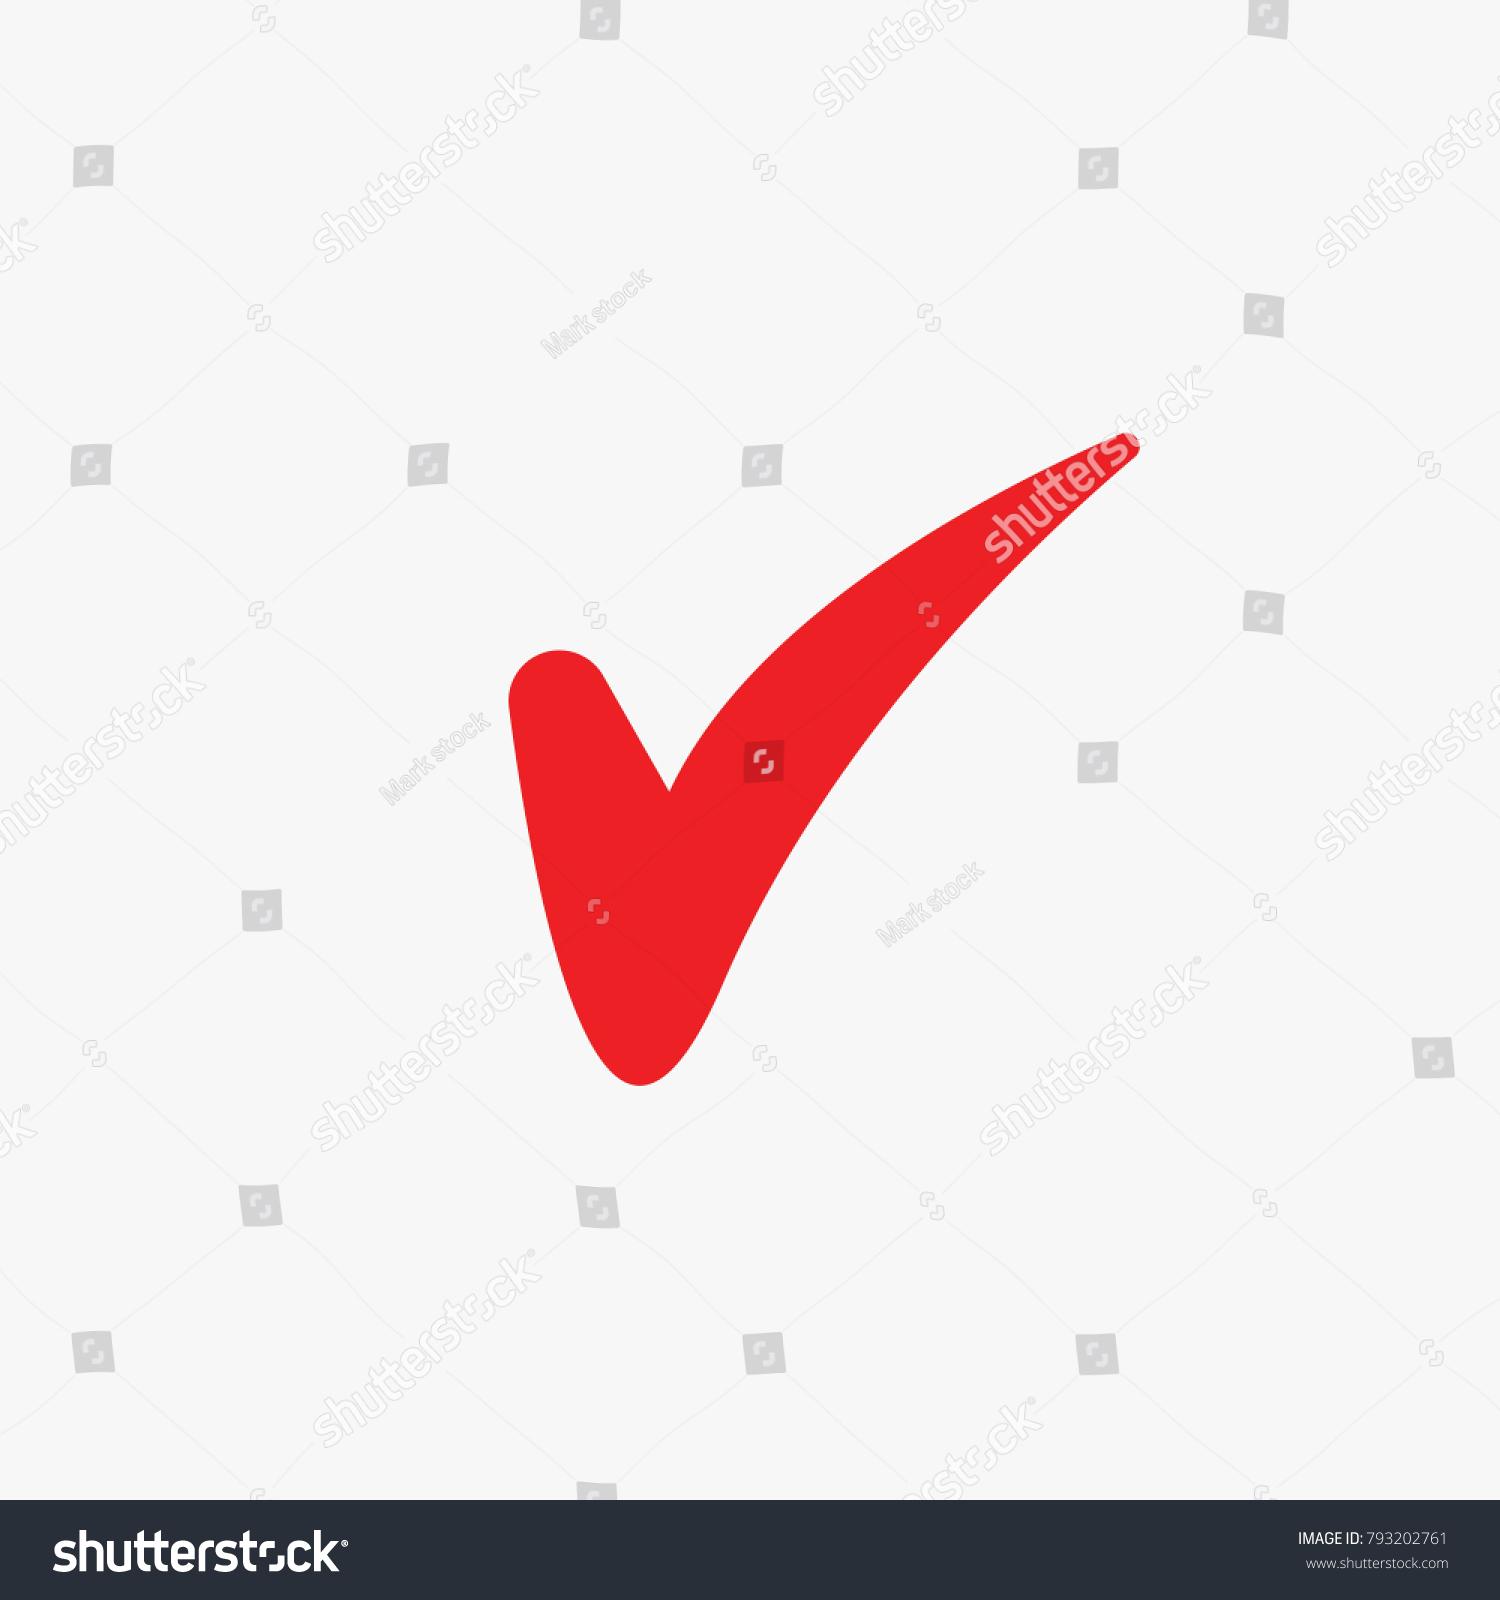 Red Tick Mark Correct Approved Your Stock Vektorgrafik Lizenzfrei